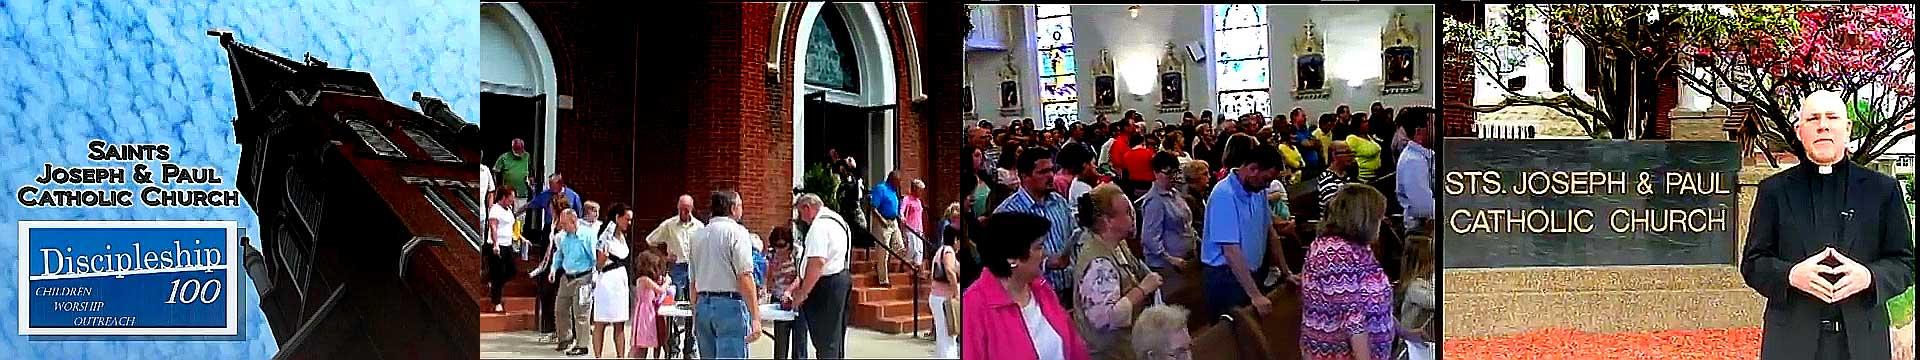 Sts Joseph and Paul Catholic Church Discipleship 100 Video